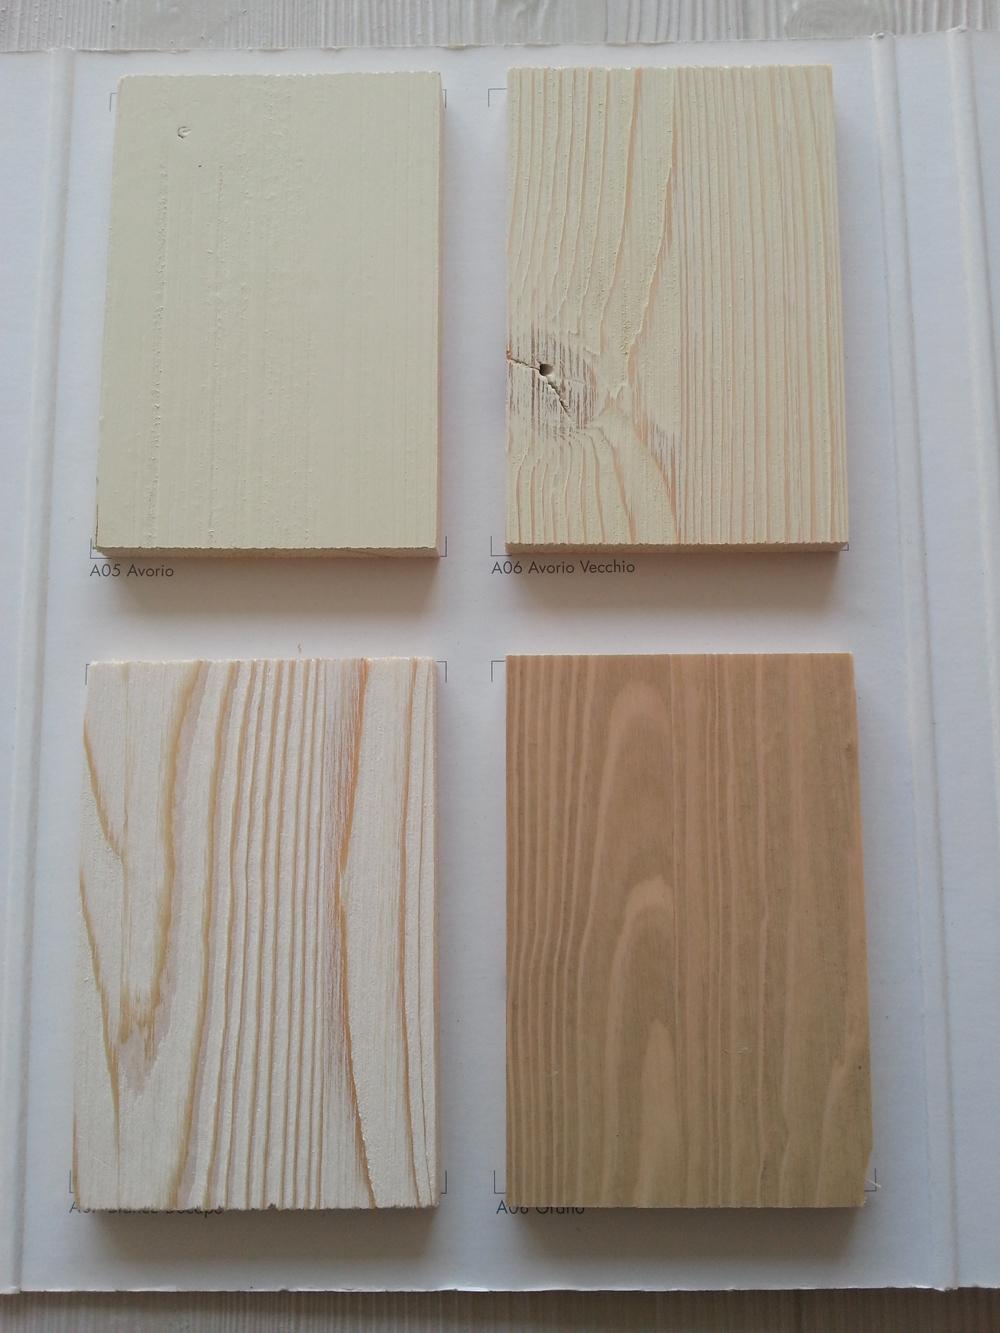 Ikea abete trendy latest cassapanca baule in legno abete for Ikea baule legno